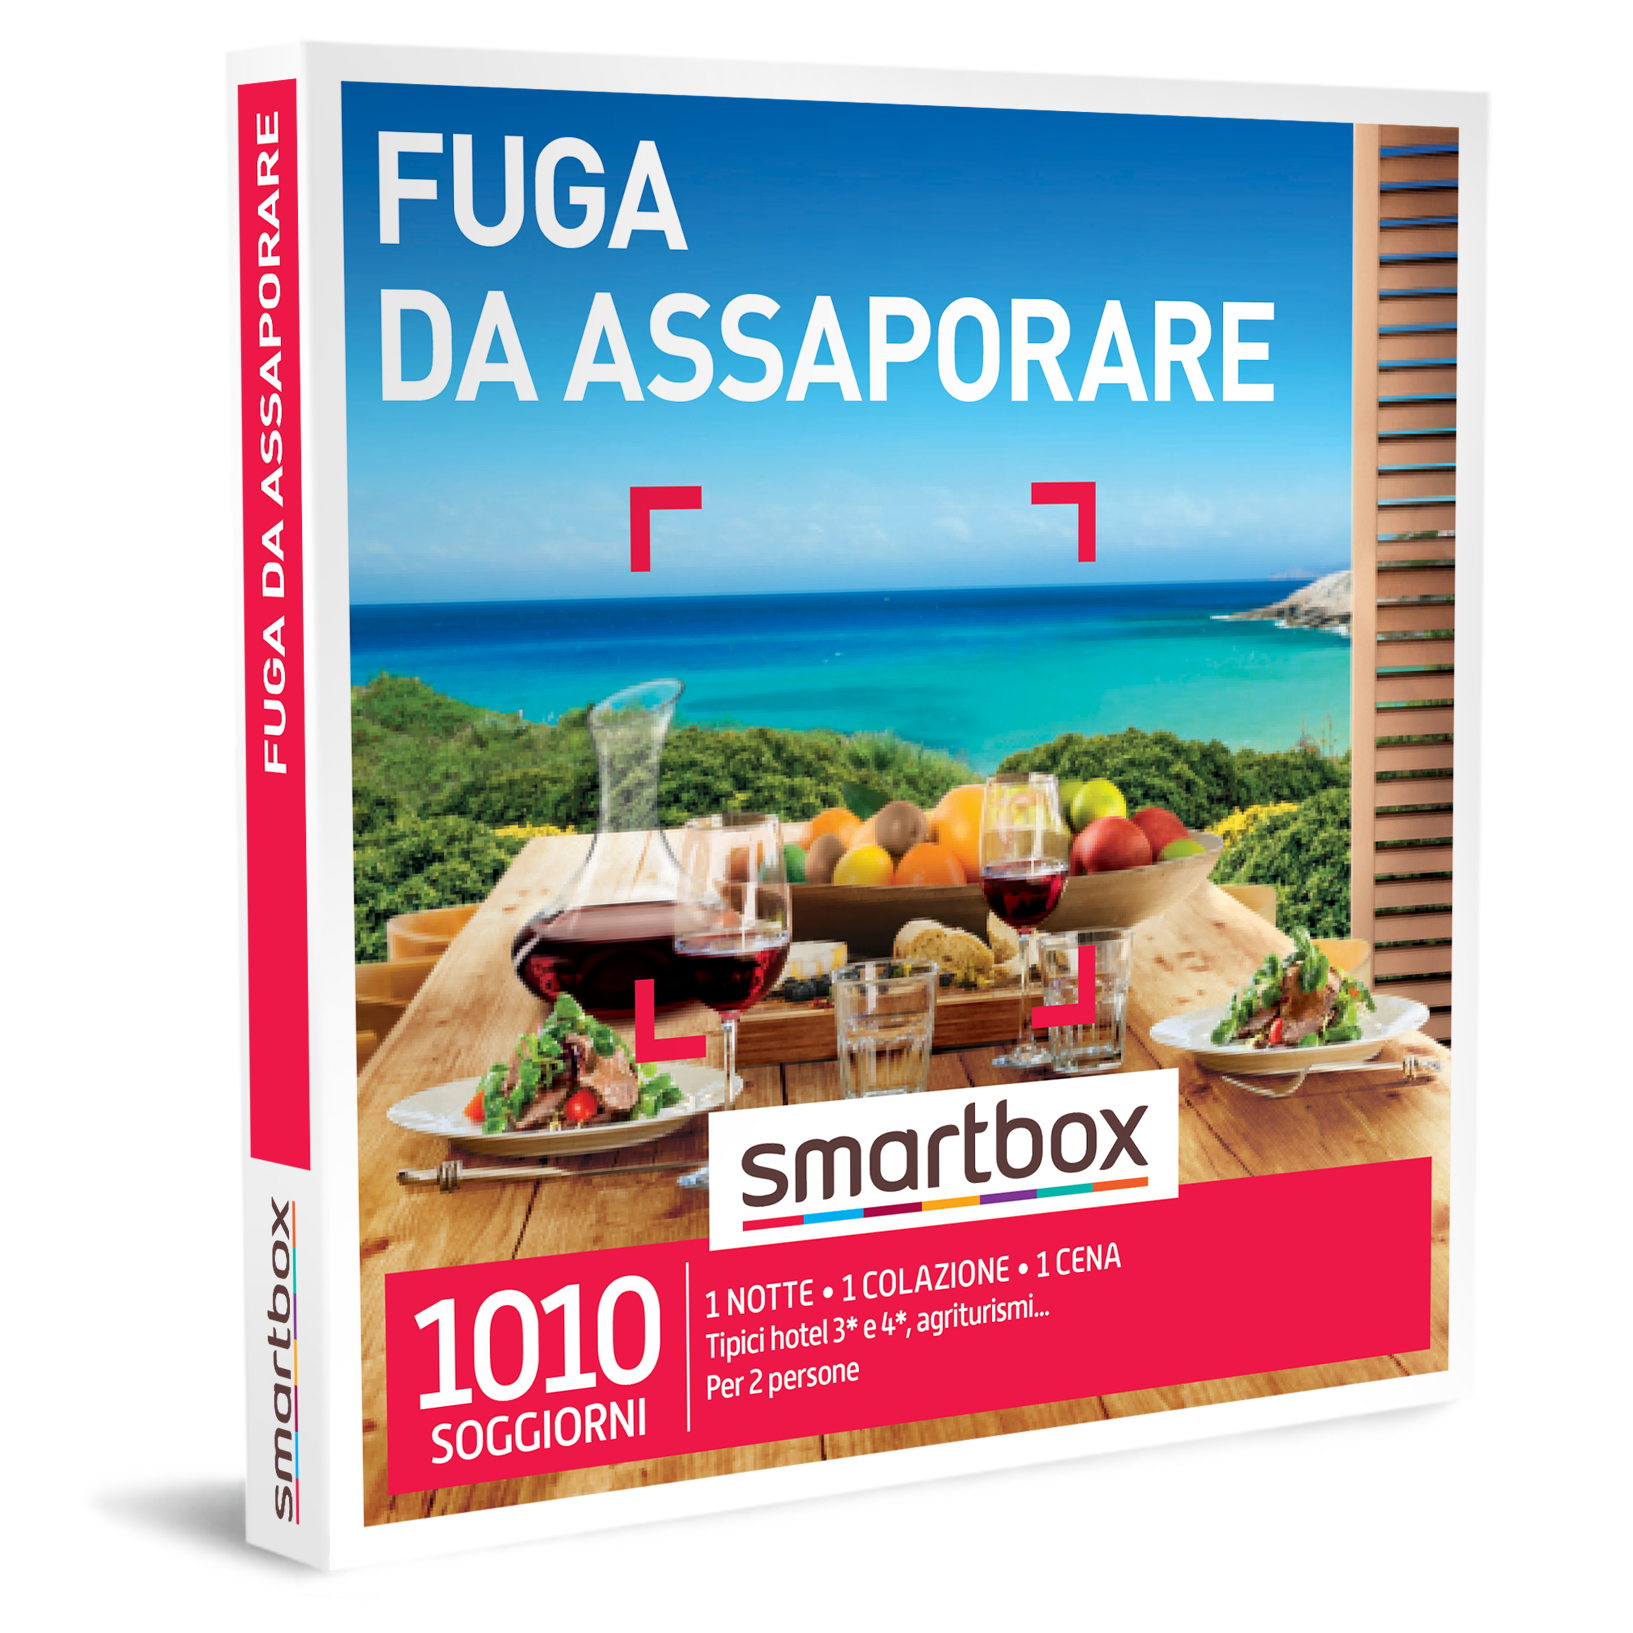 Smartbox e-box Fuga da Assaporare €89,90